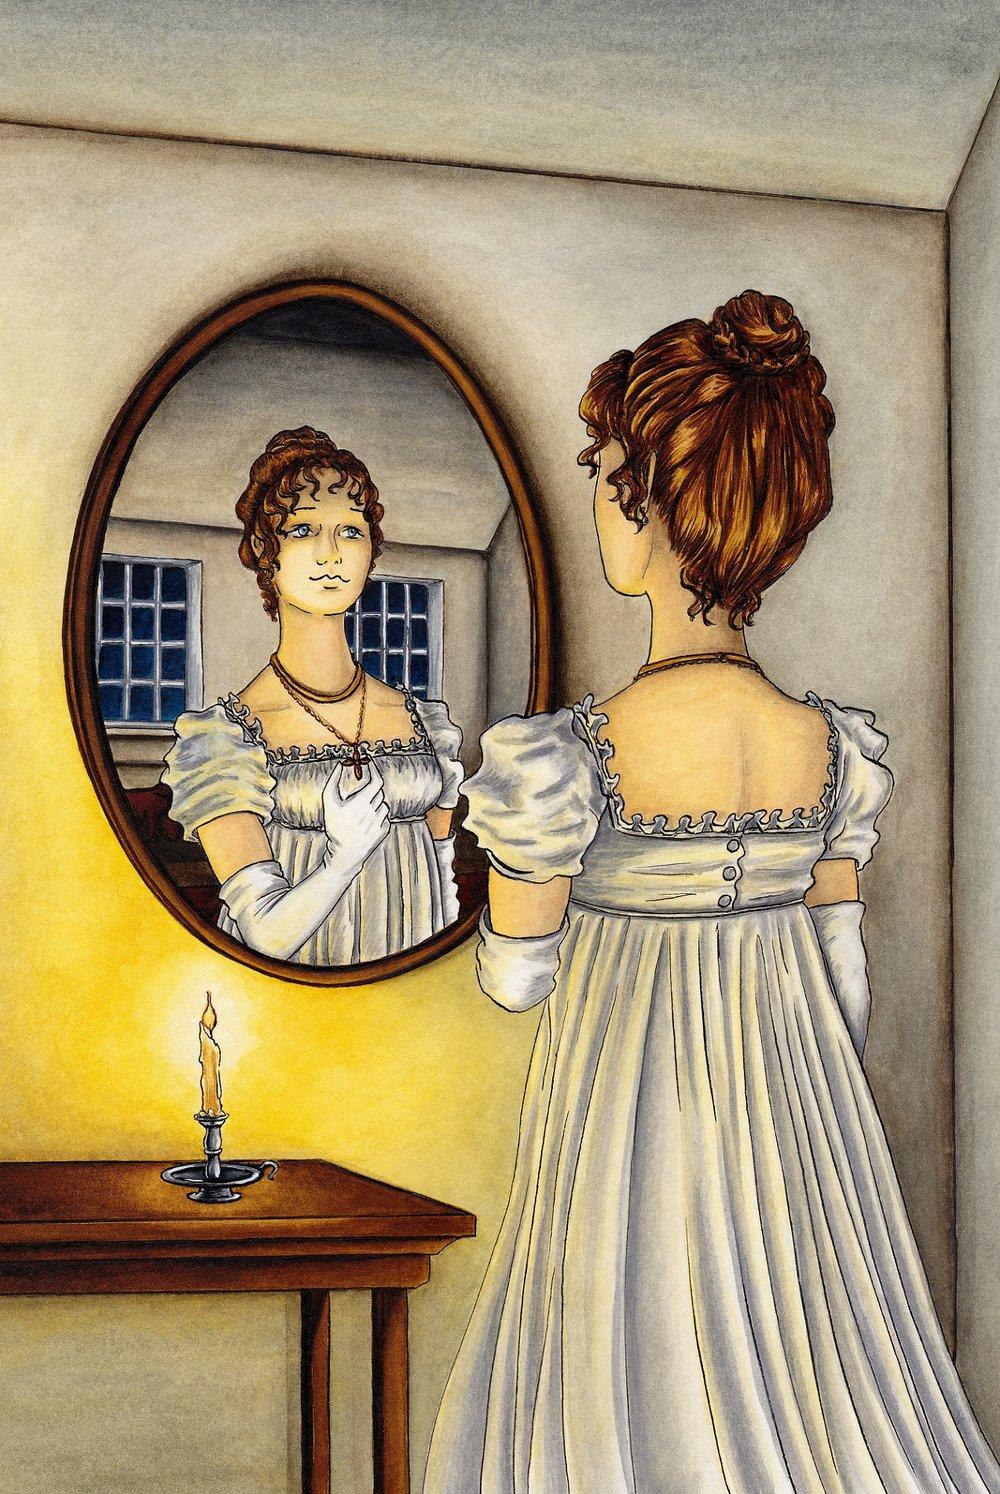 Illustration 2 - Alison Schofield.jpg